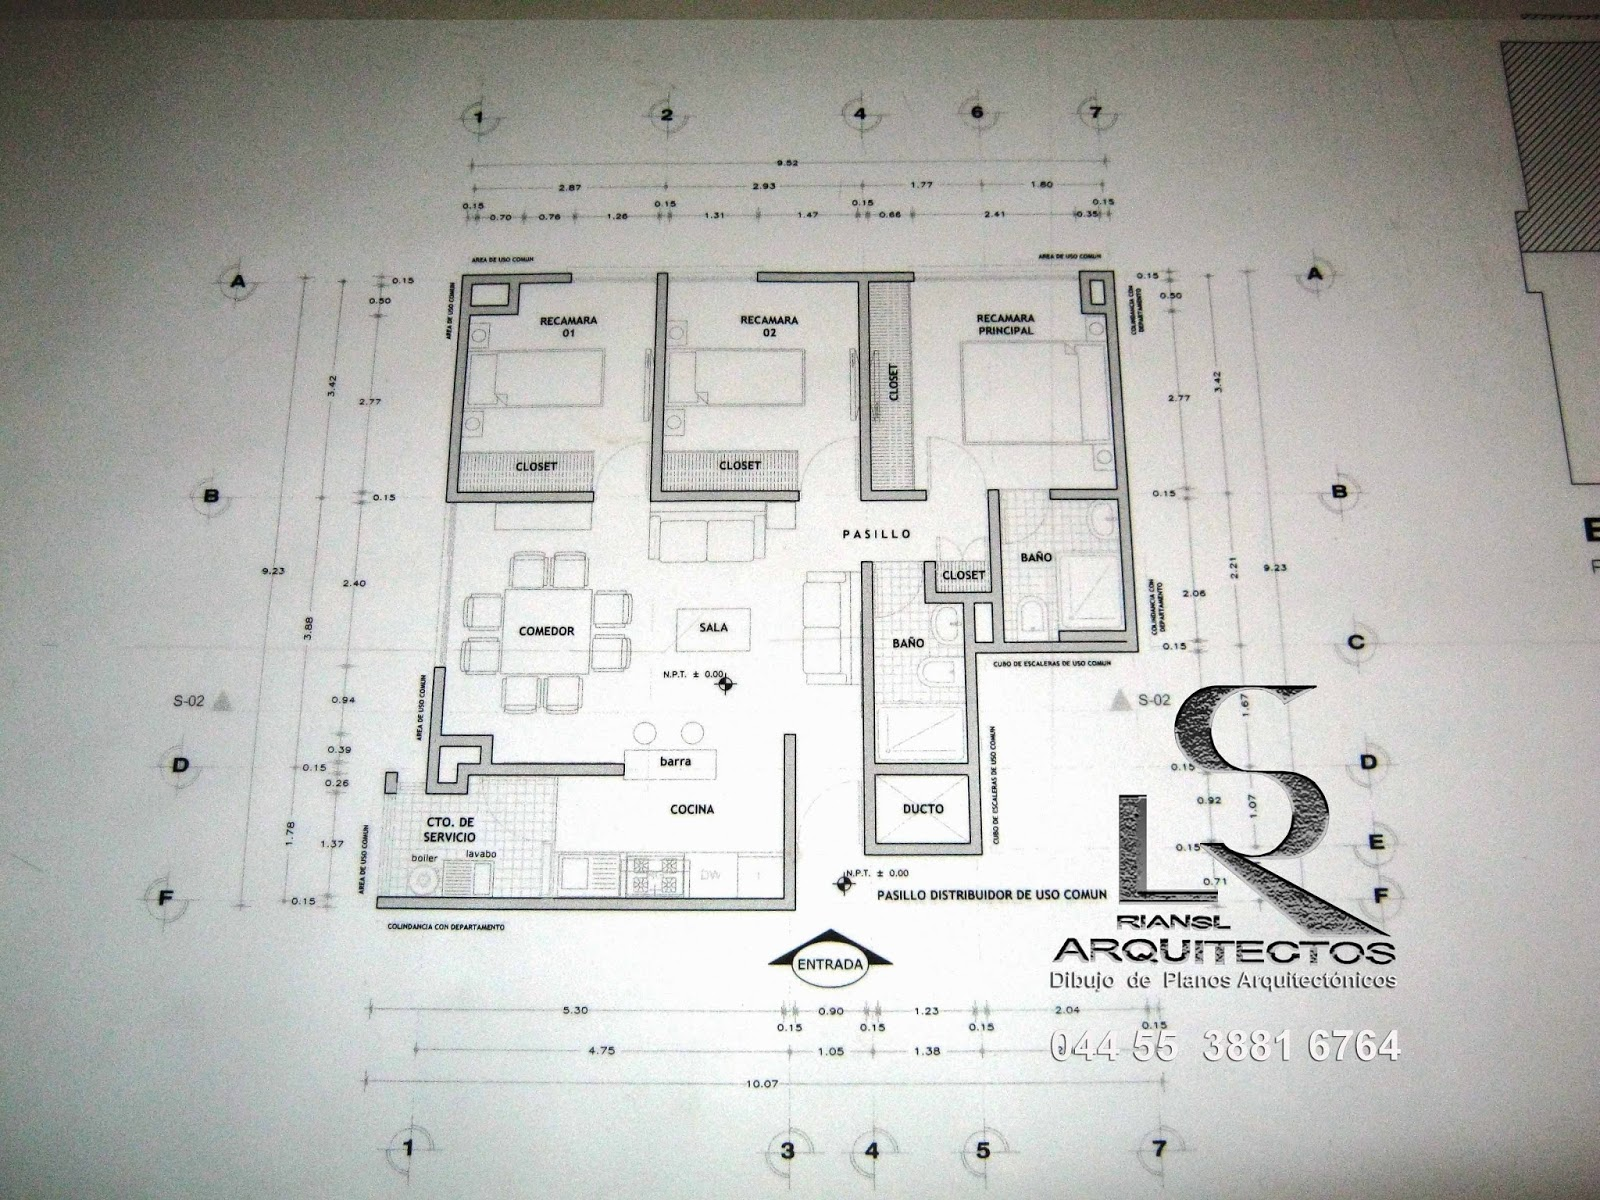 Arq rigoberto s nchez especialista en dibujo de planos for Simbologia de puertas en planos arquitectonicos